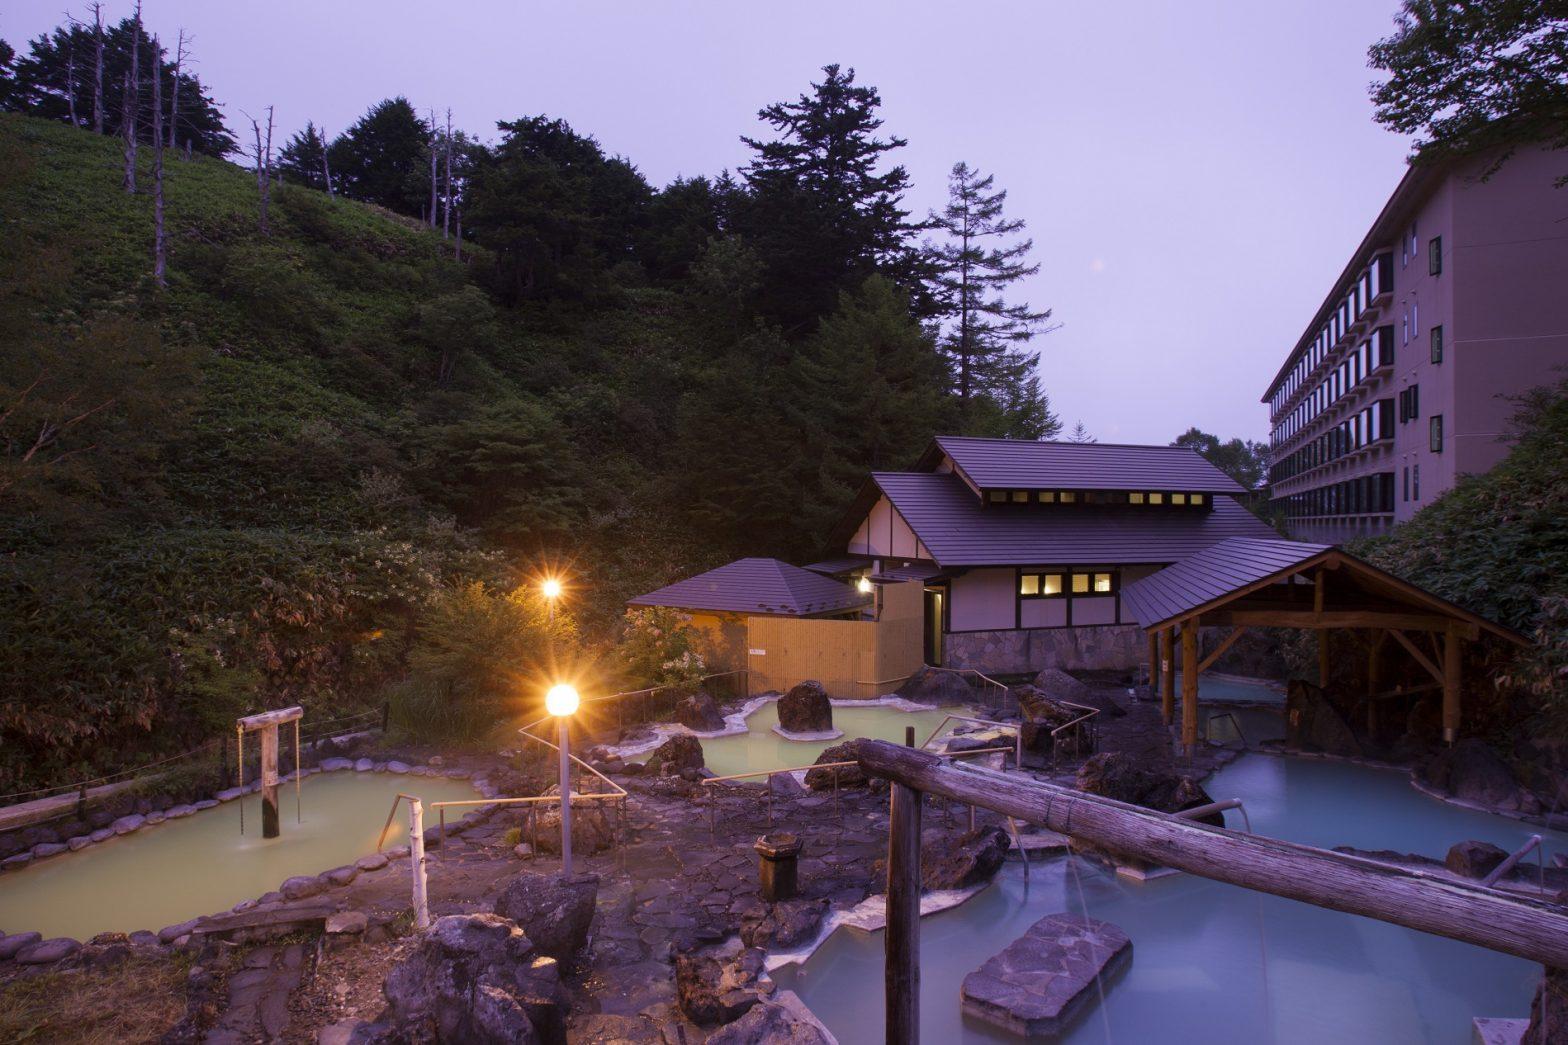 Hot Springs Guide